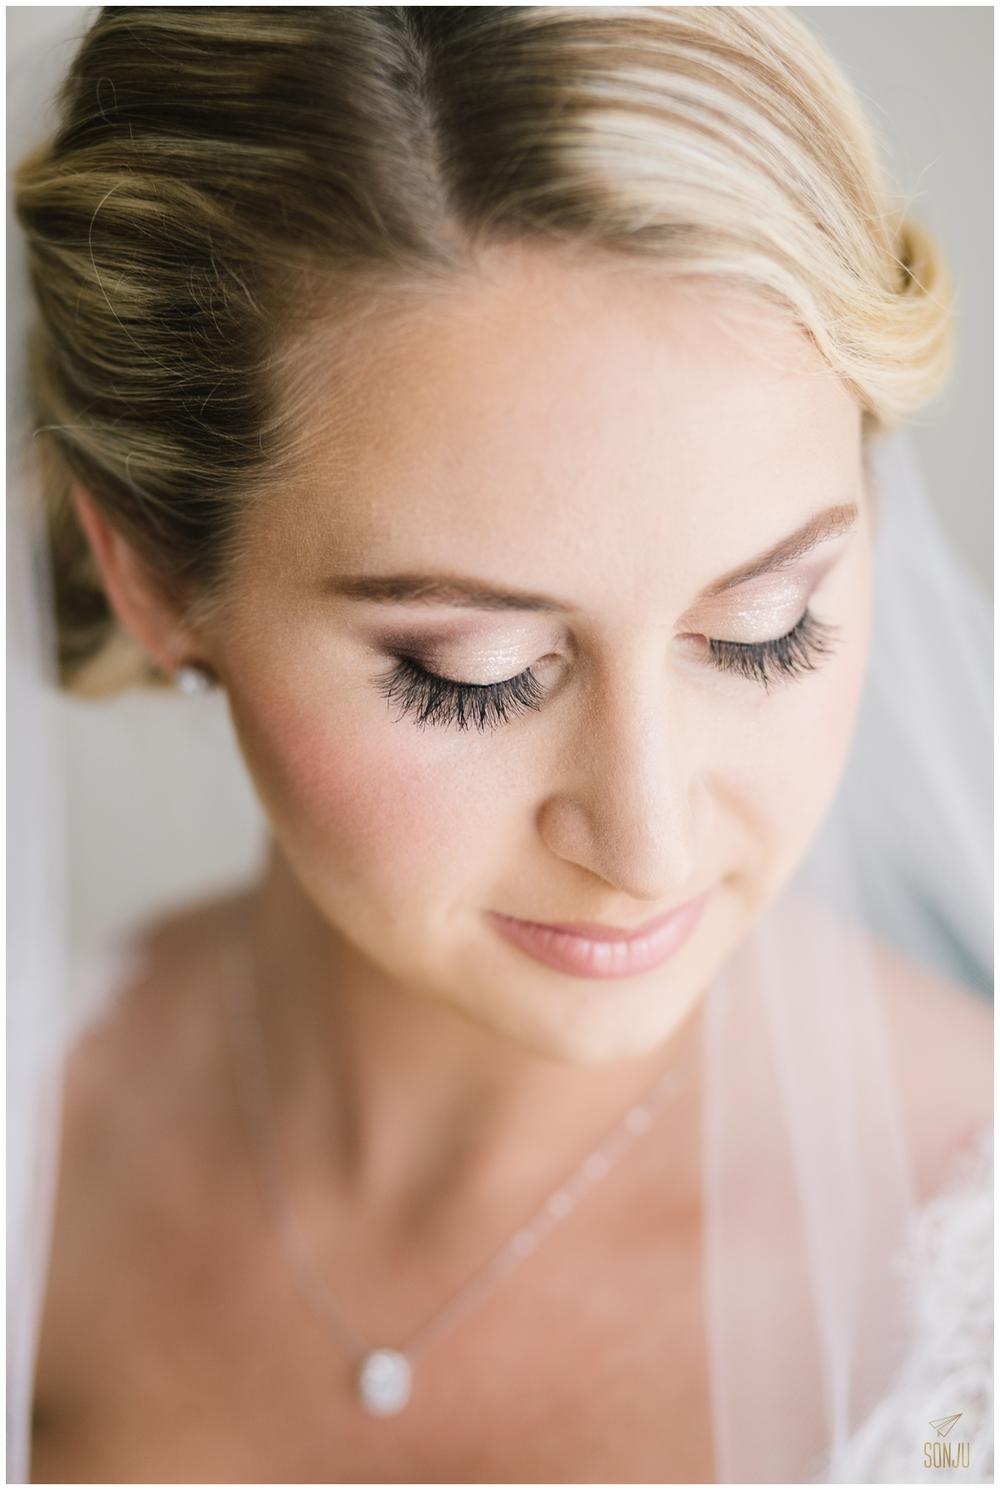 Hughs-Culinary-Ft-Lauderdale-Wedding-Photographer-Jessica-Billy00009.jpg